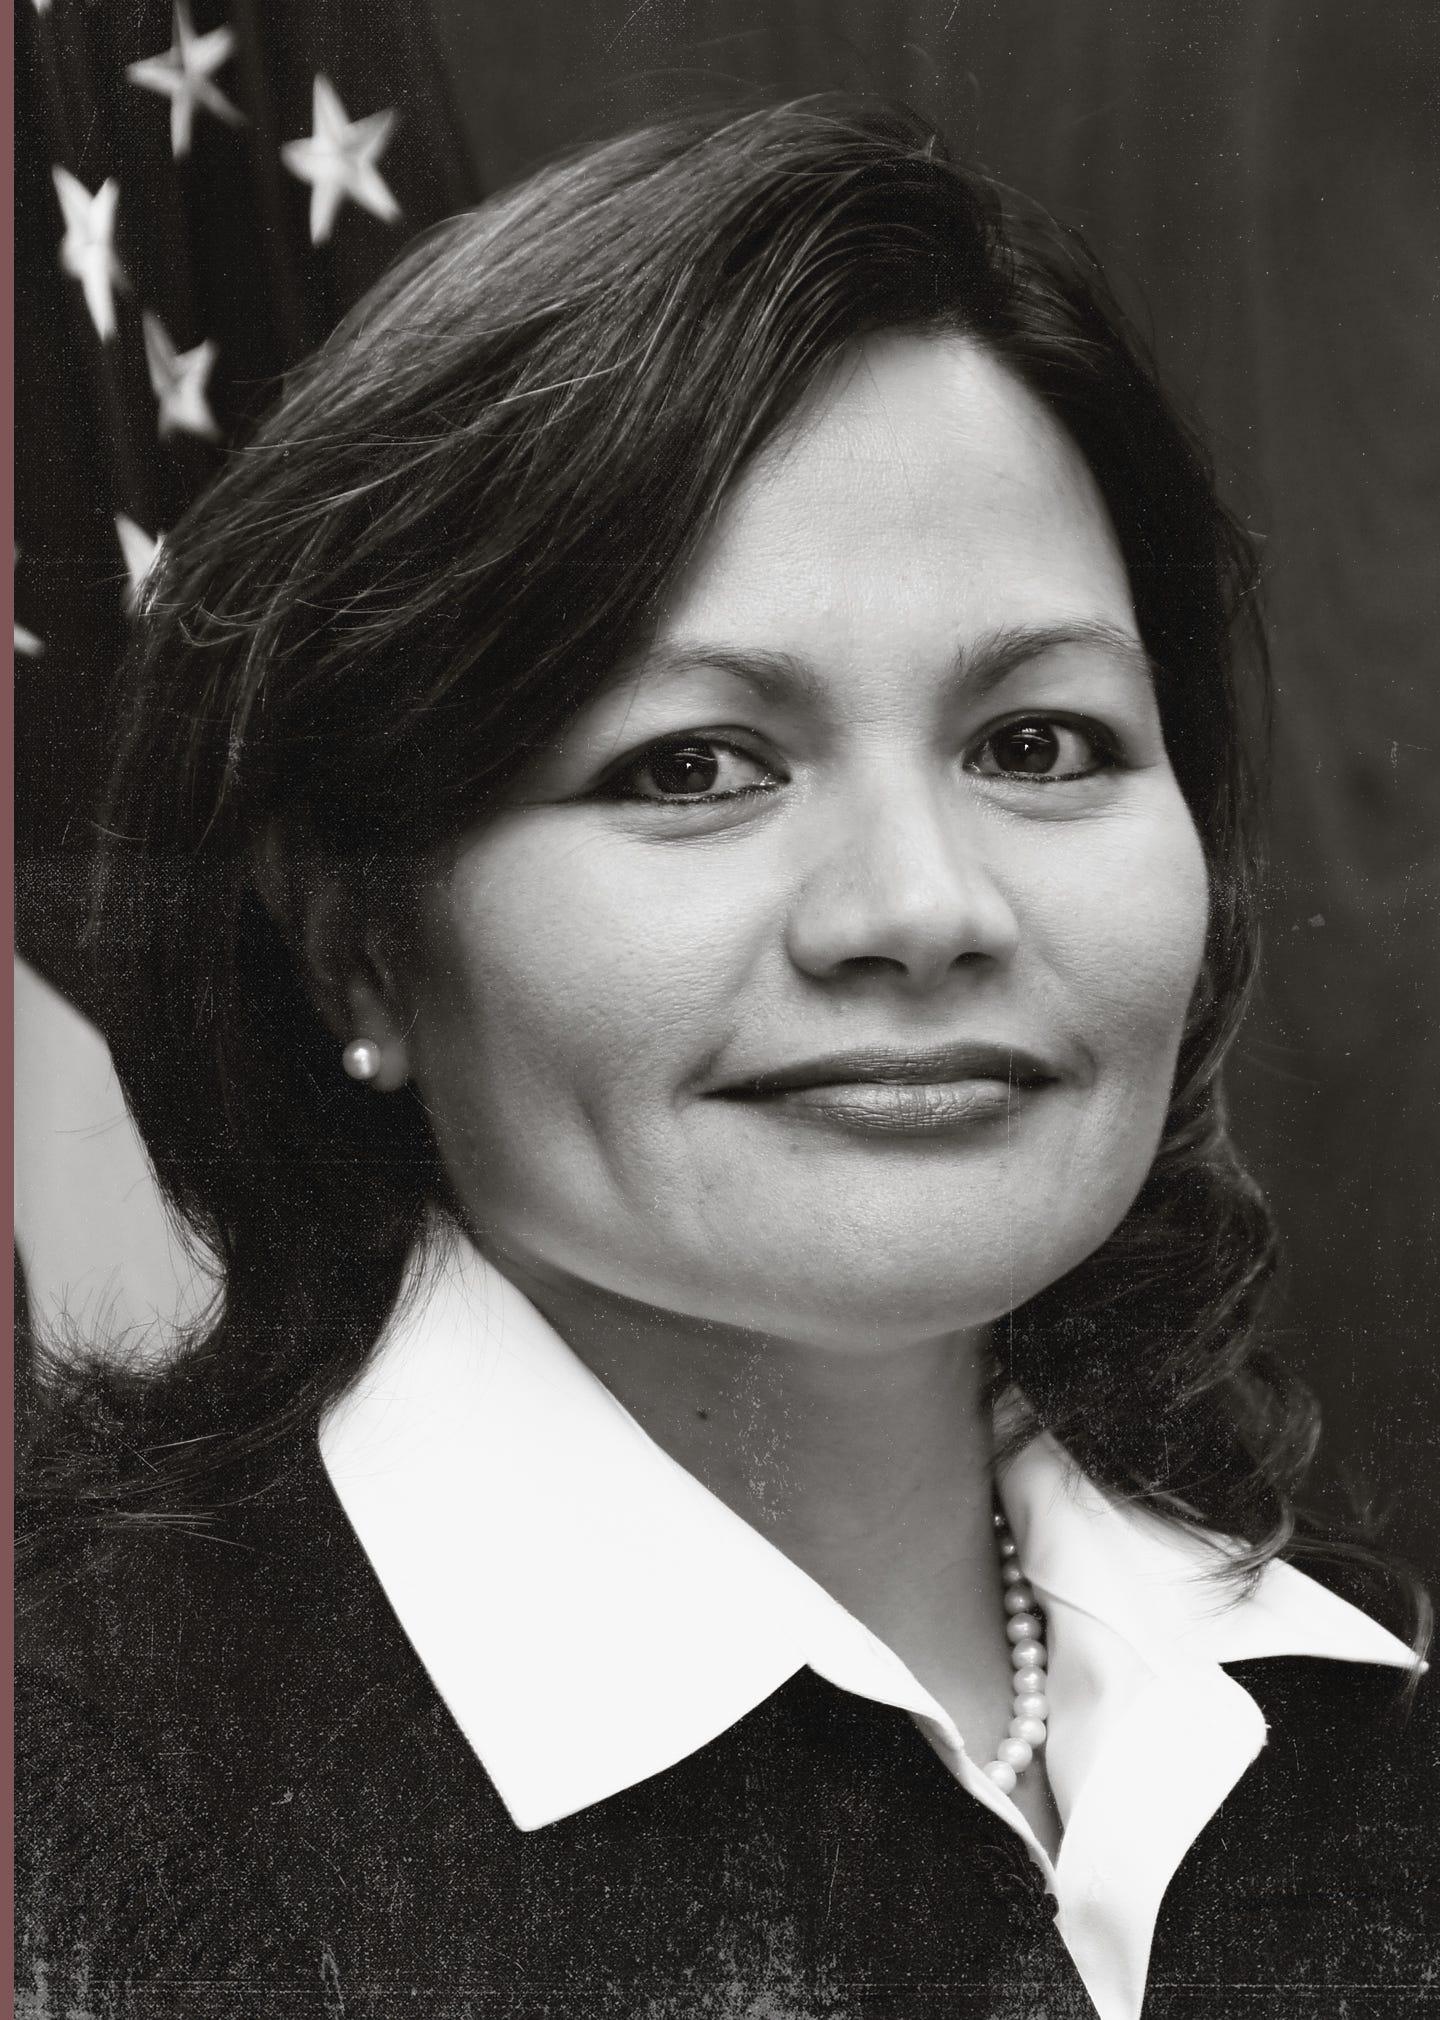 Ramona Villagomez Manglona